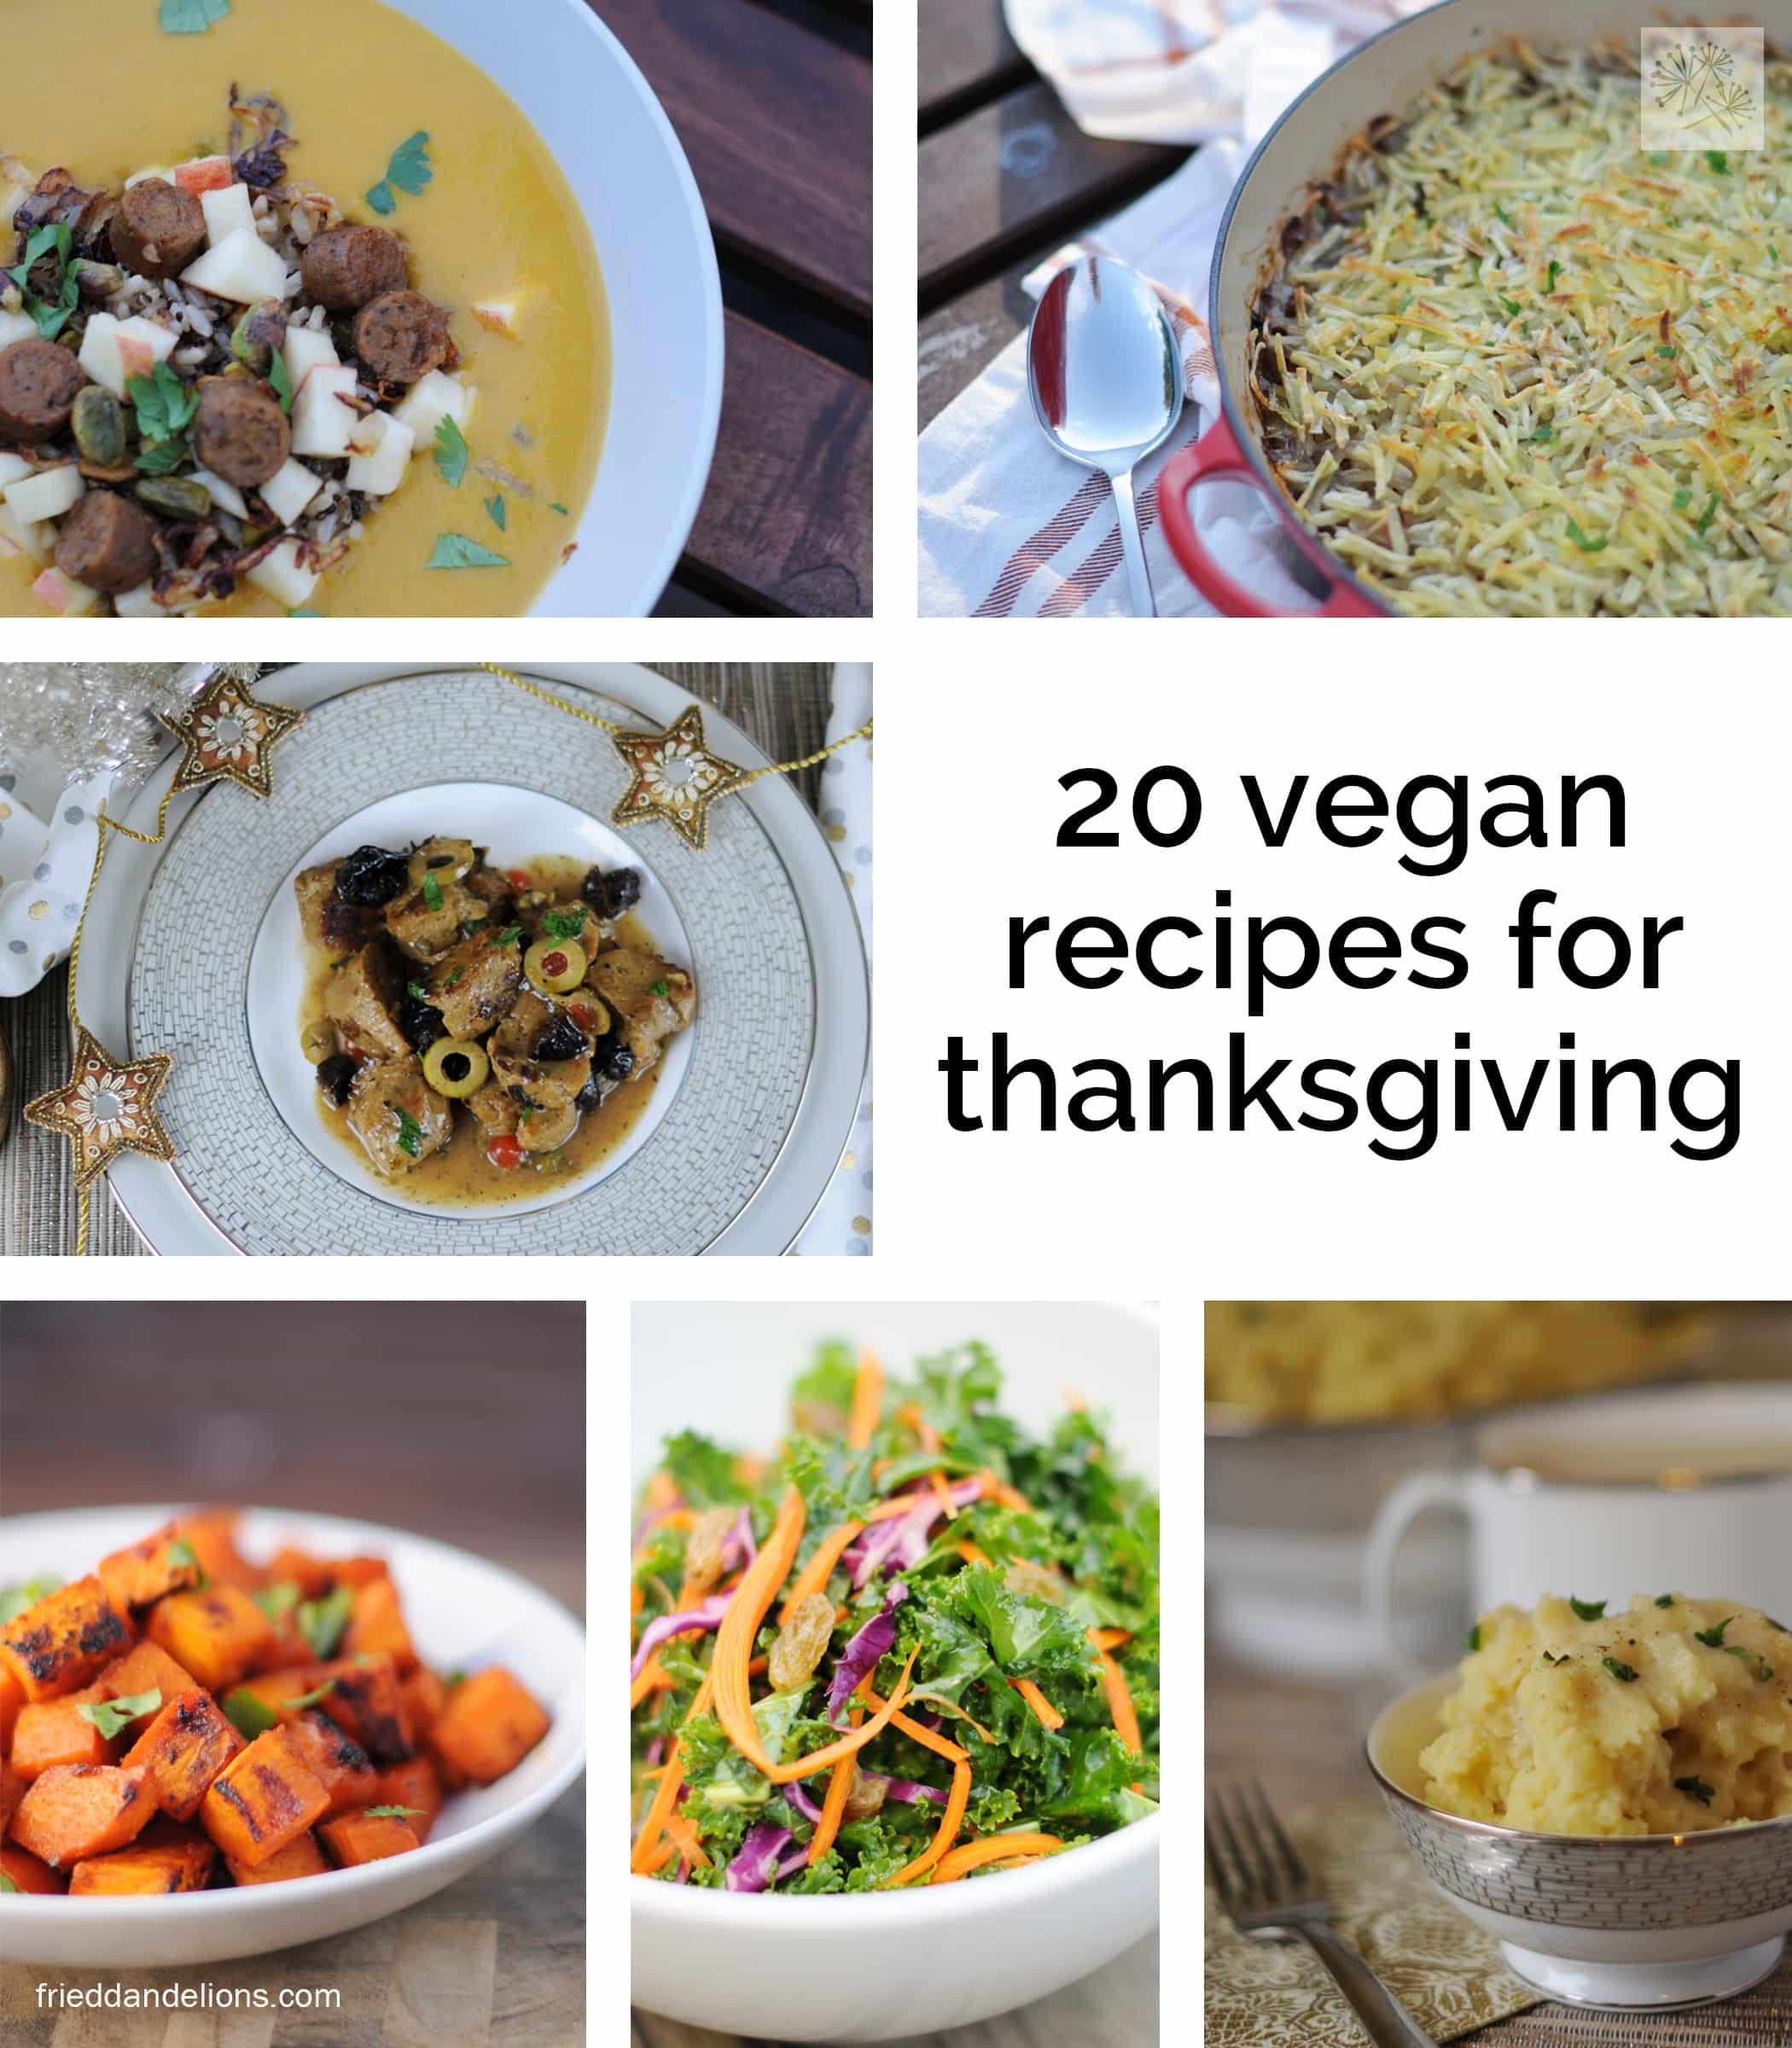 20 Vegan Recipes For Thanksgiving!